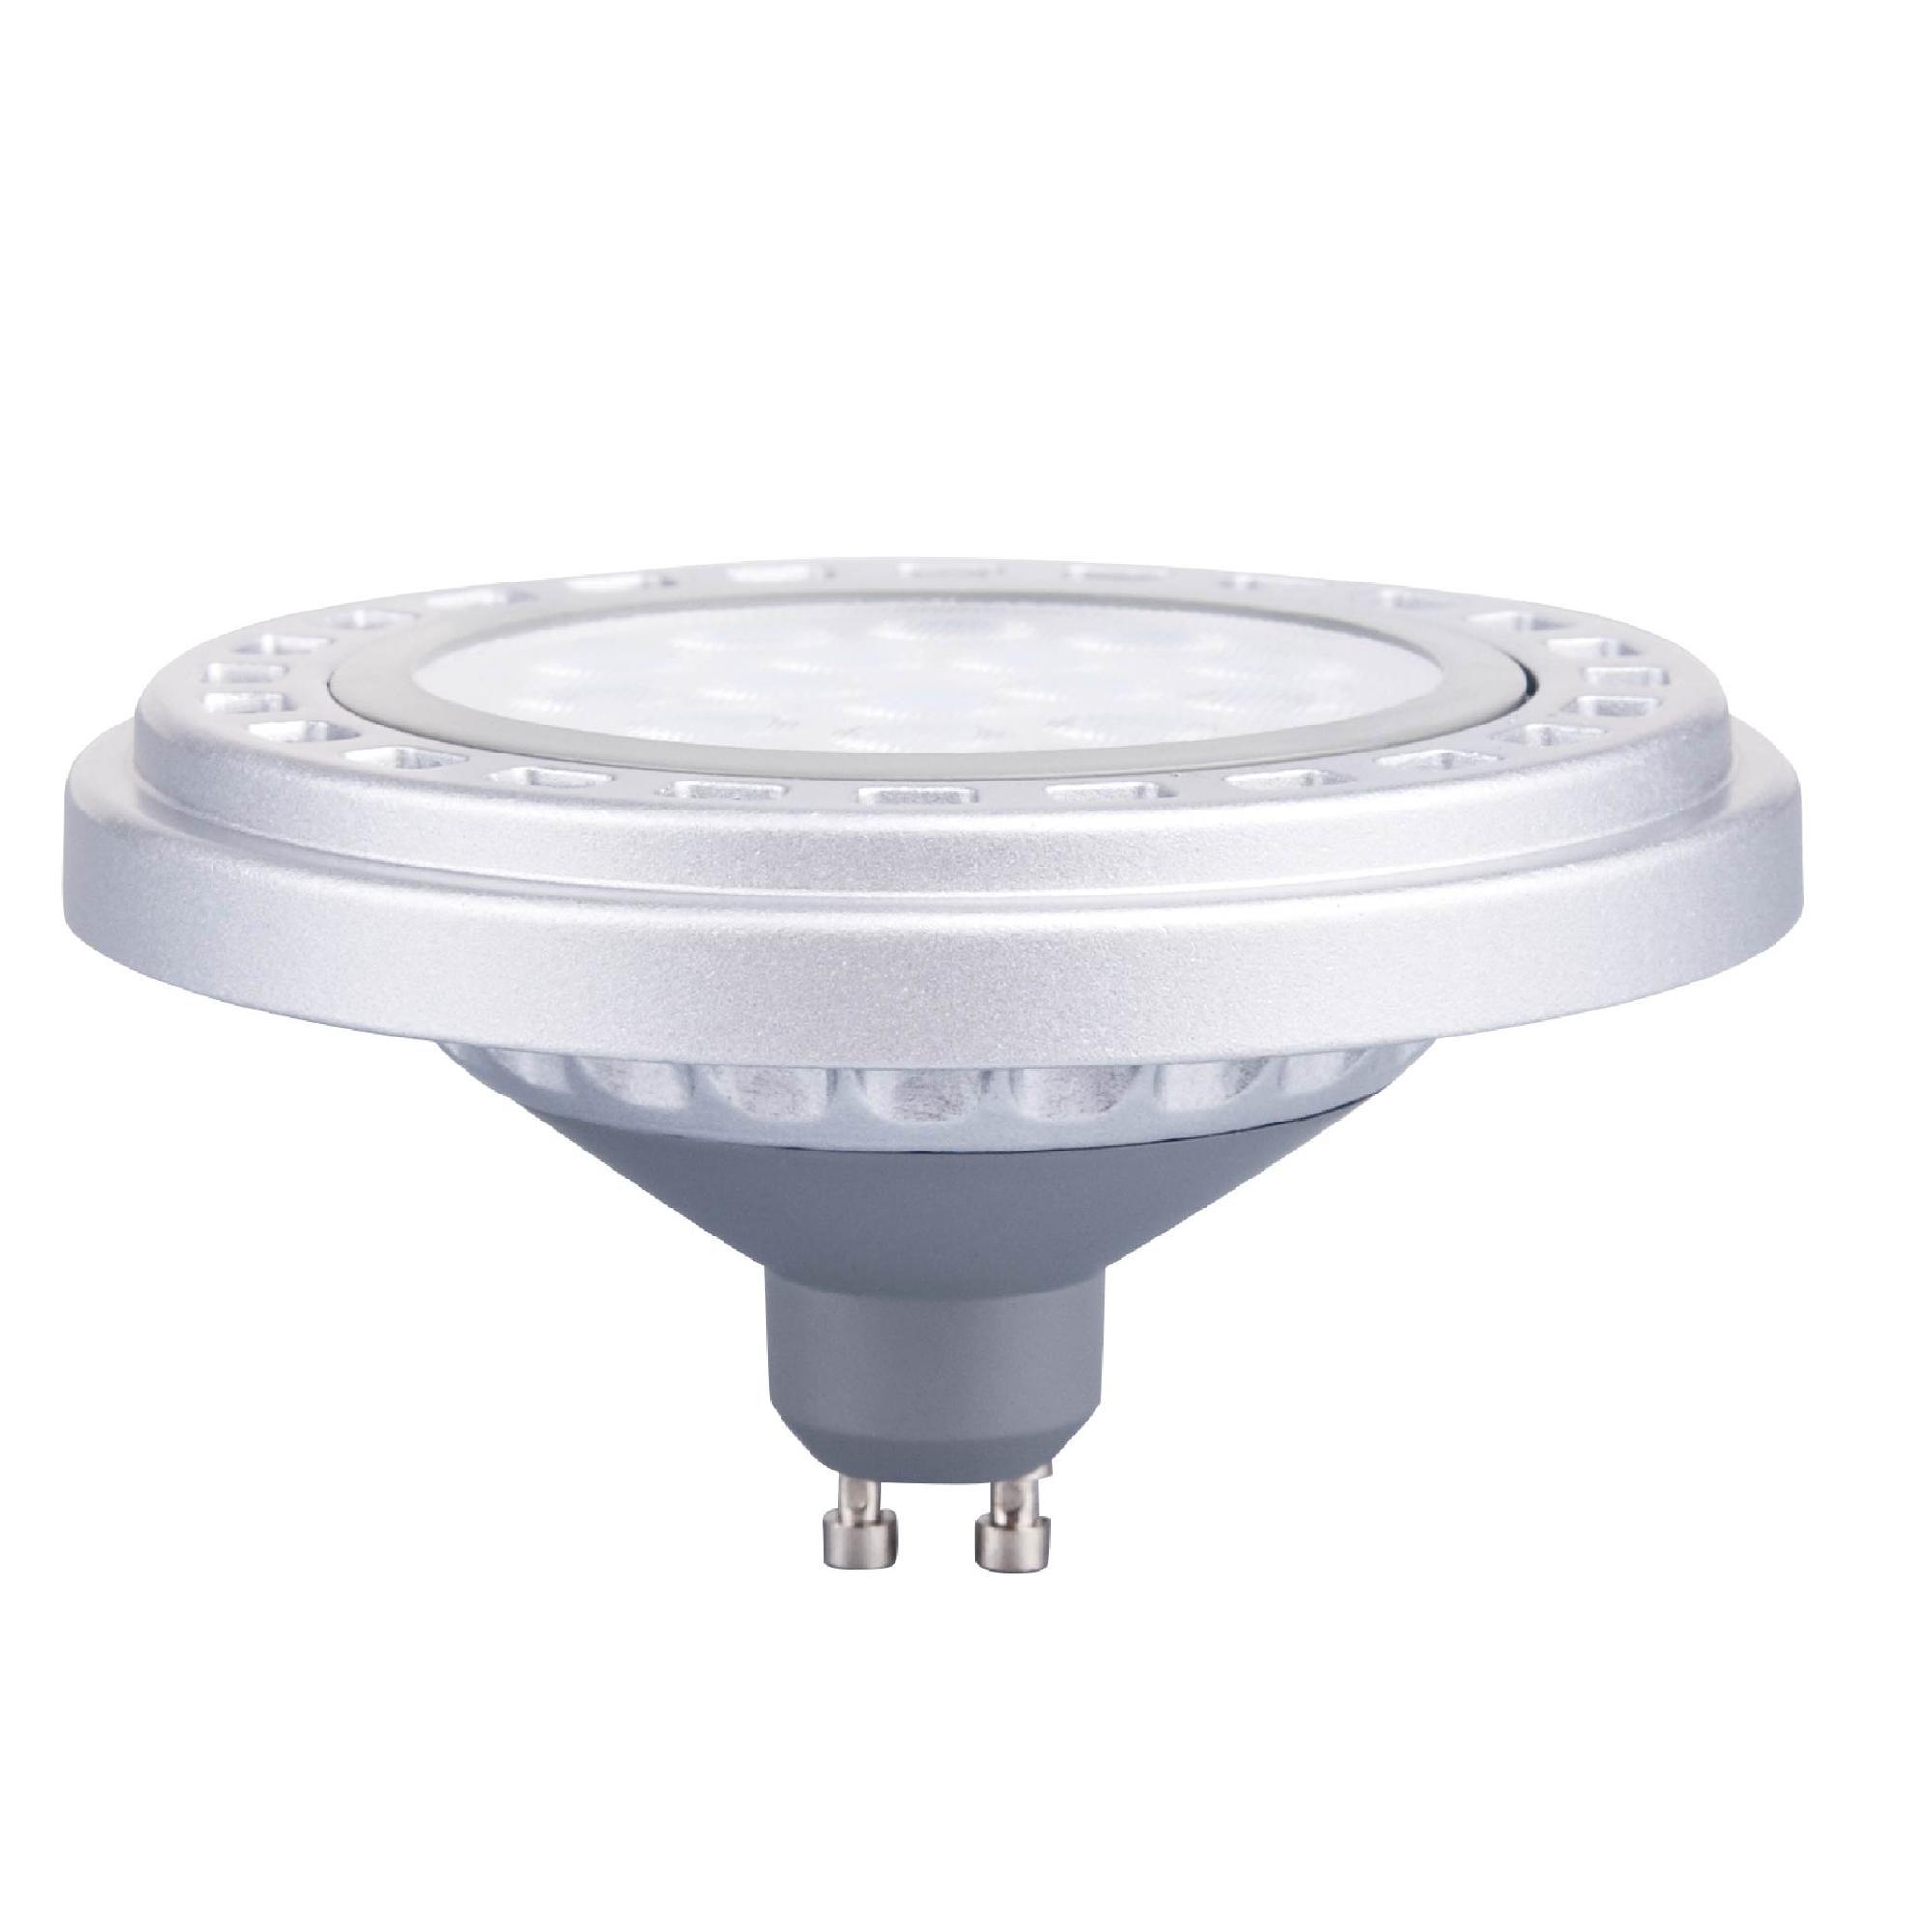 Best Price 12w 15w Gu10 G5.3 Led spotlight AR111 high lumen Driver linear IC with good quality